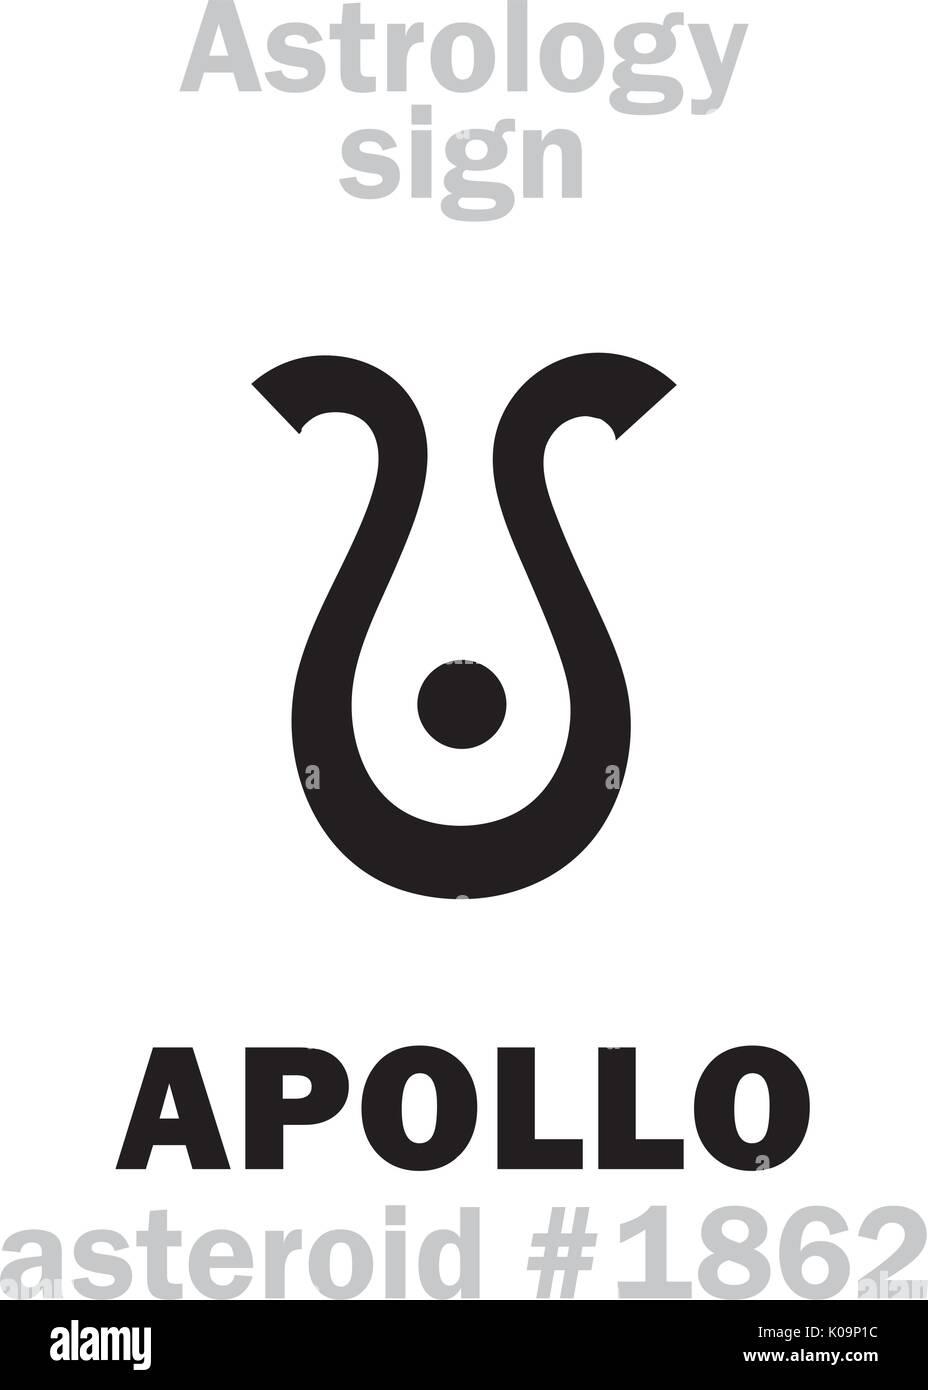 Apollo hermes stock photos apollo hermes stock images alamy astrology alphabet apollo musagetes asteroid 1862 hieroglyphics character sign biocorpaavc